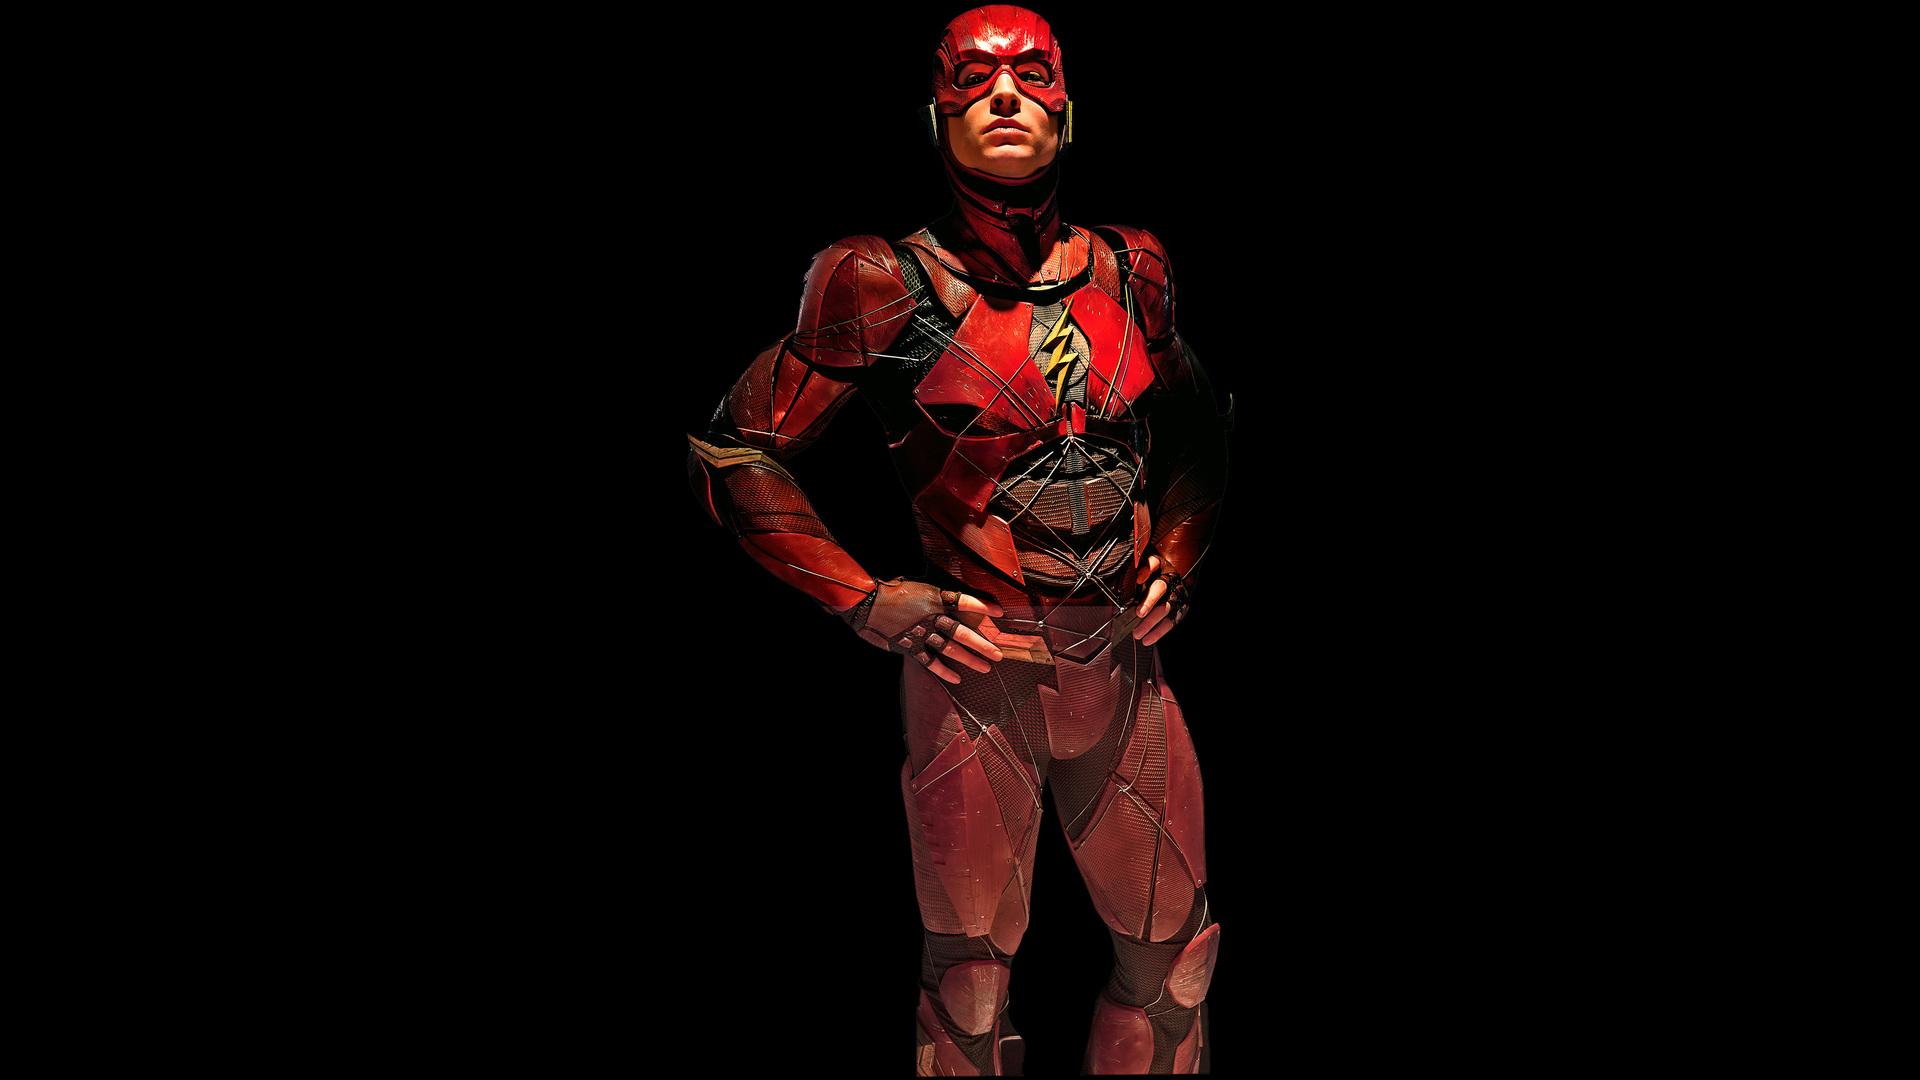 1920x1080 flash justice league 4k laptop full hd 1080p hd - Flash wallpaper hd 1080p ...